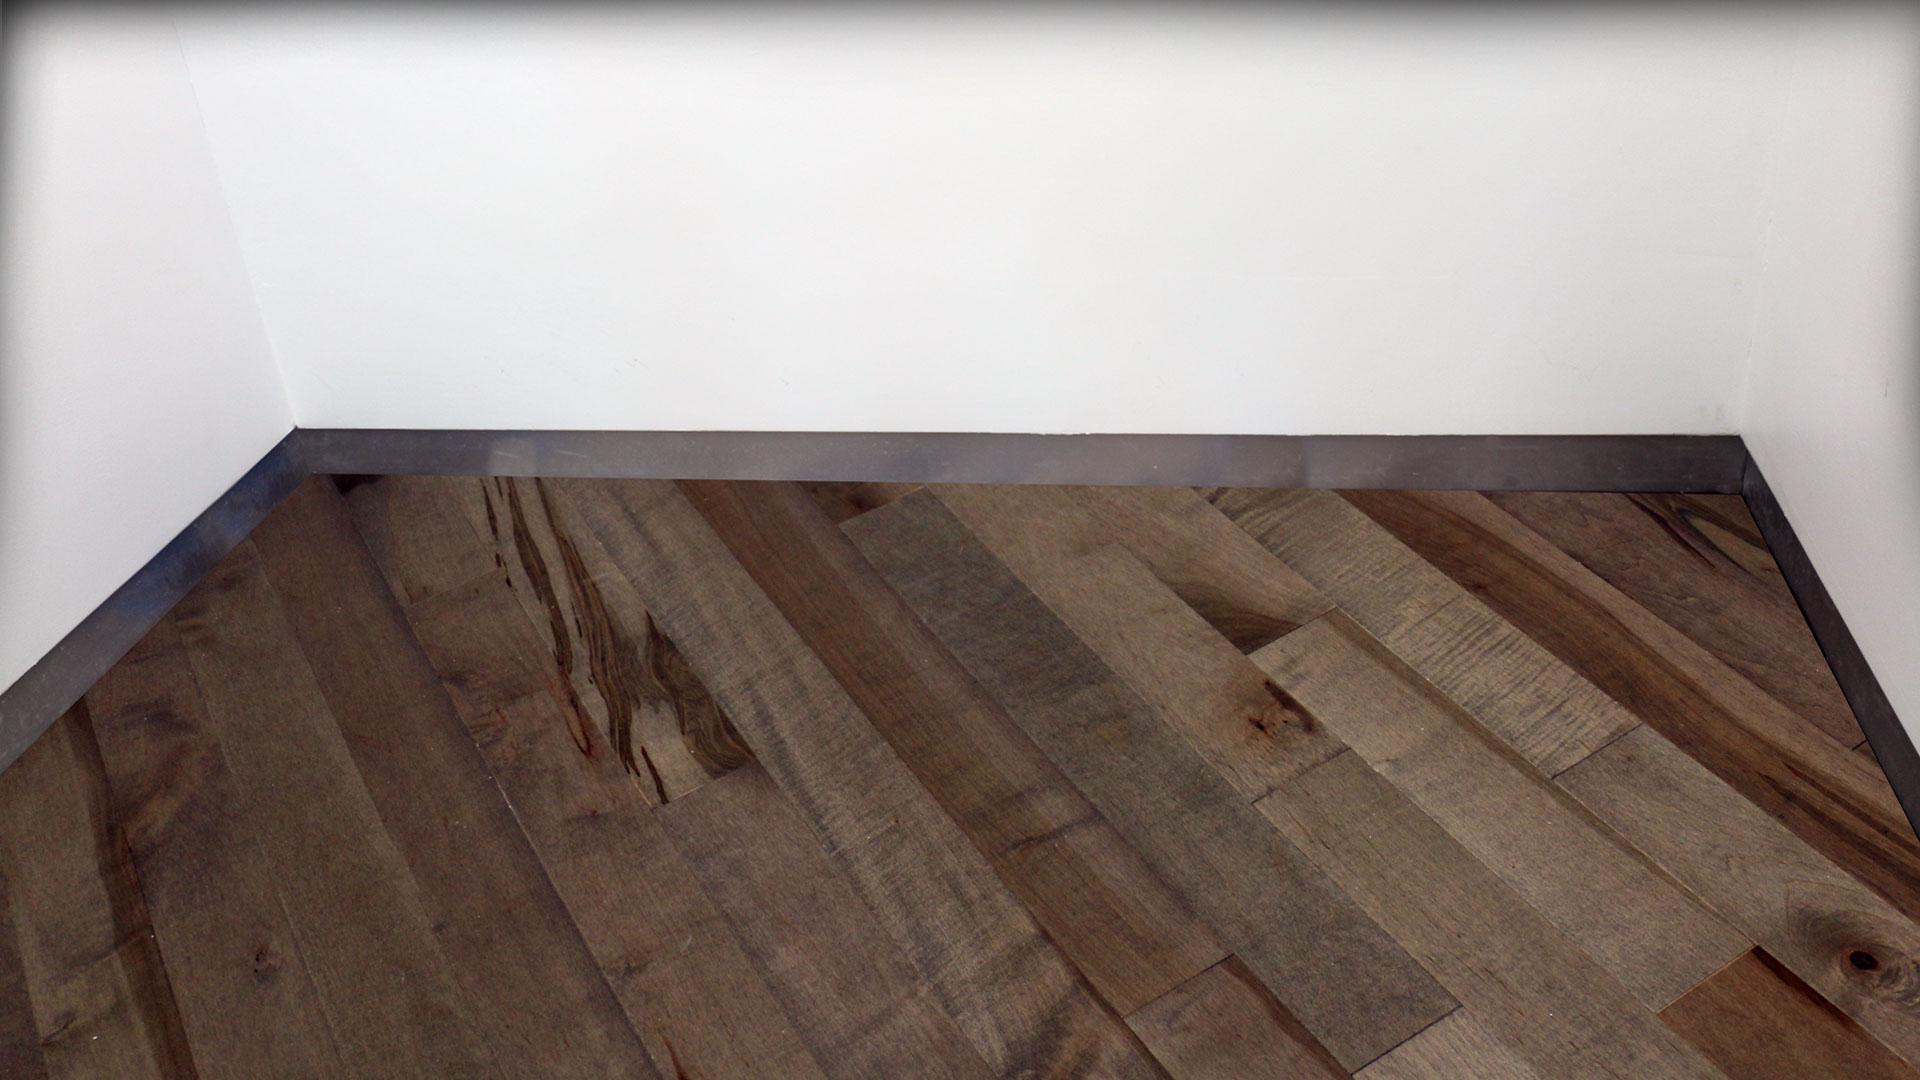 Aluminum baseboard vinson baseboard green oxen for Mid century modern baseboard